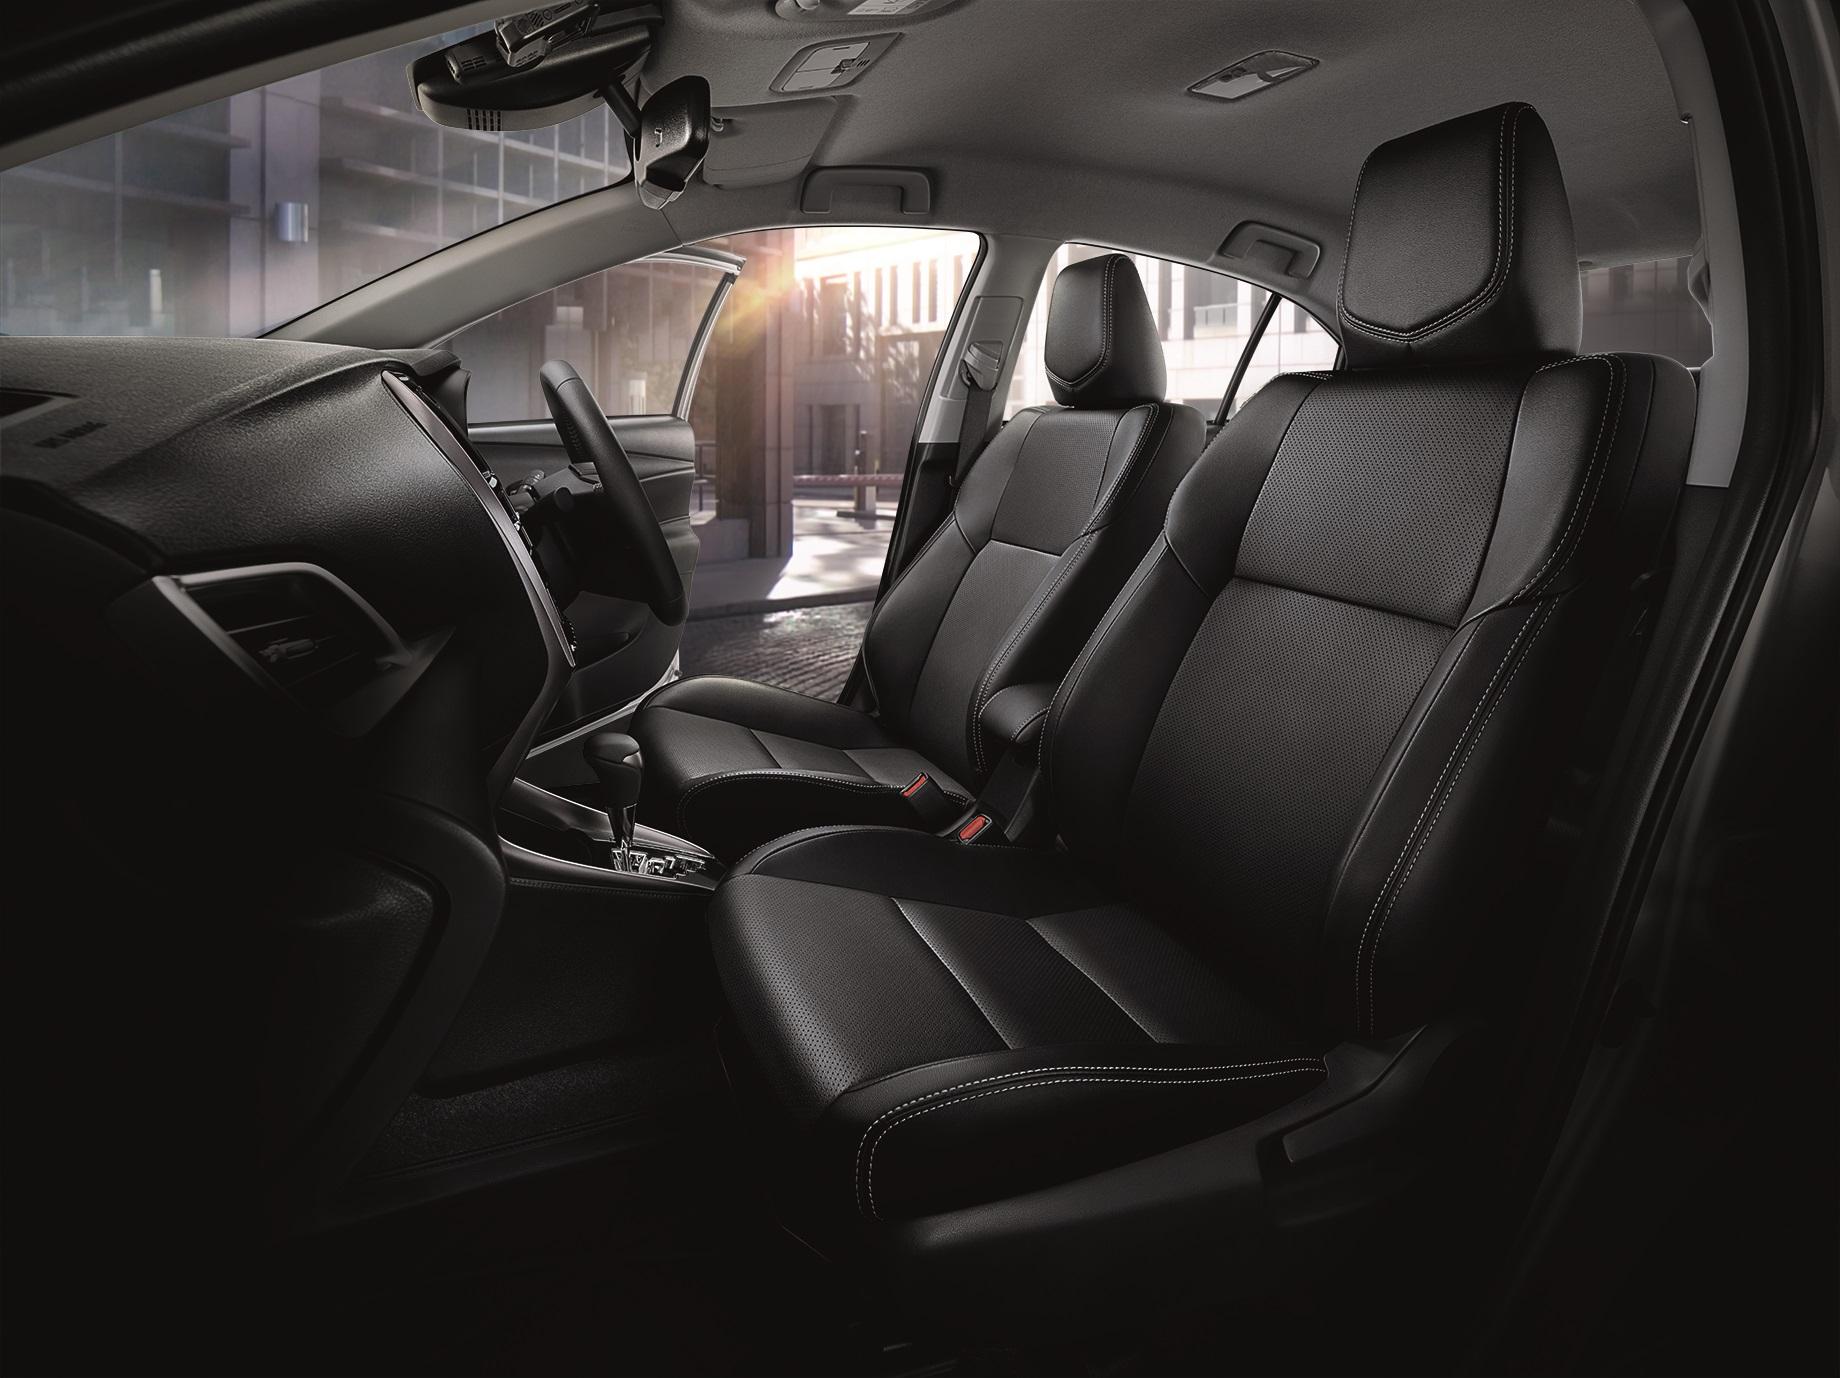 Toyota Yaris Ativ 2021 X-Urban Flash II Package AutoinfoOnline (21)